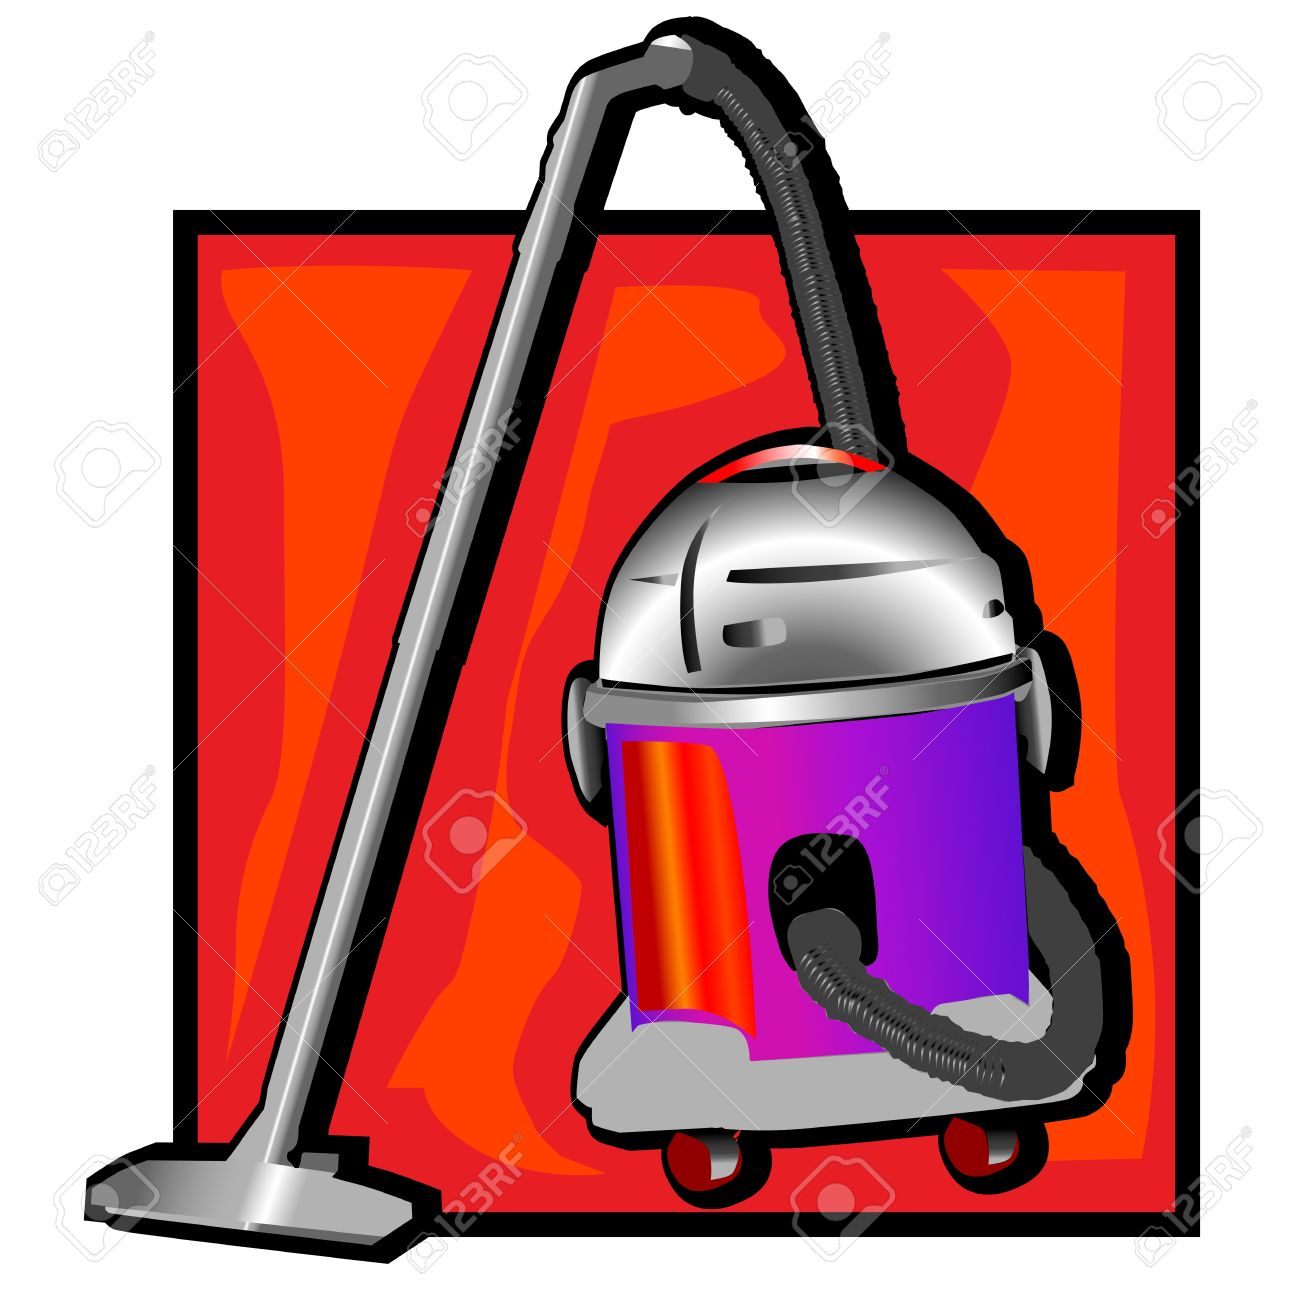 Retro Vacuum Cleaner Clip Art Royalty Free Cliparts, Vectors, And.